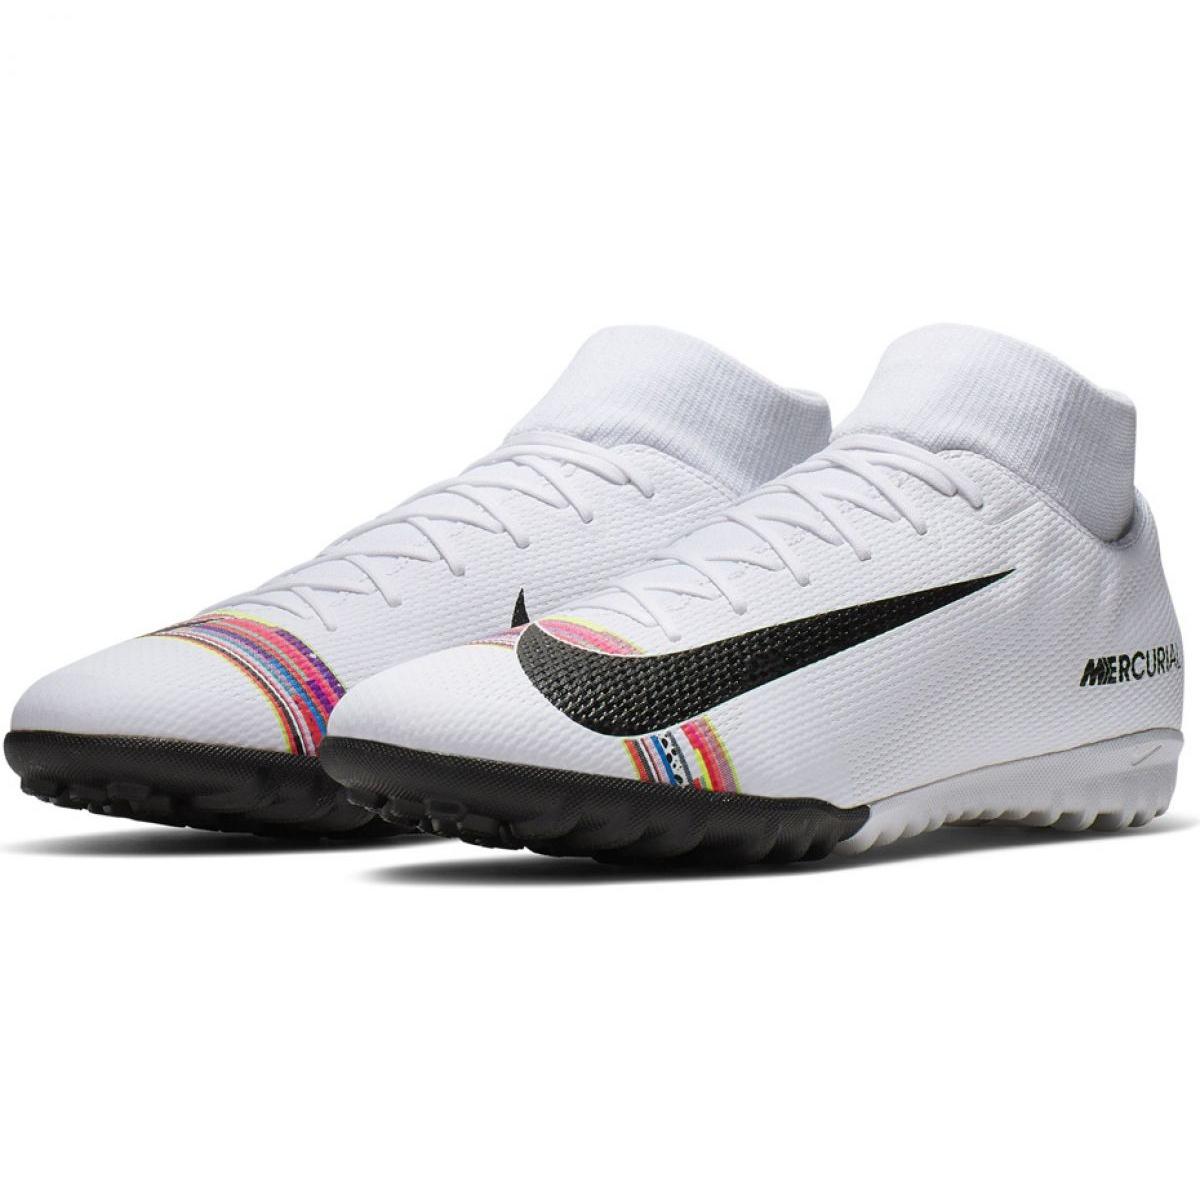 d123e0a3 Fodboldsko Nike Mercurial Superfly X 6 Academy Tf M AJ3568-109 billede 3